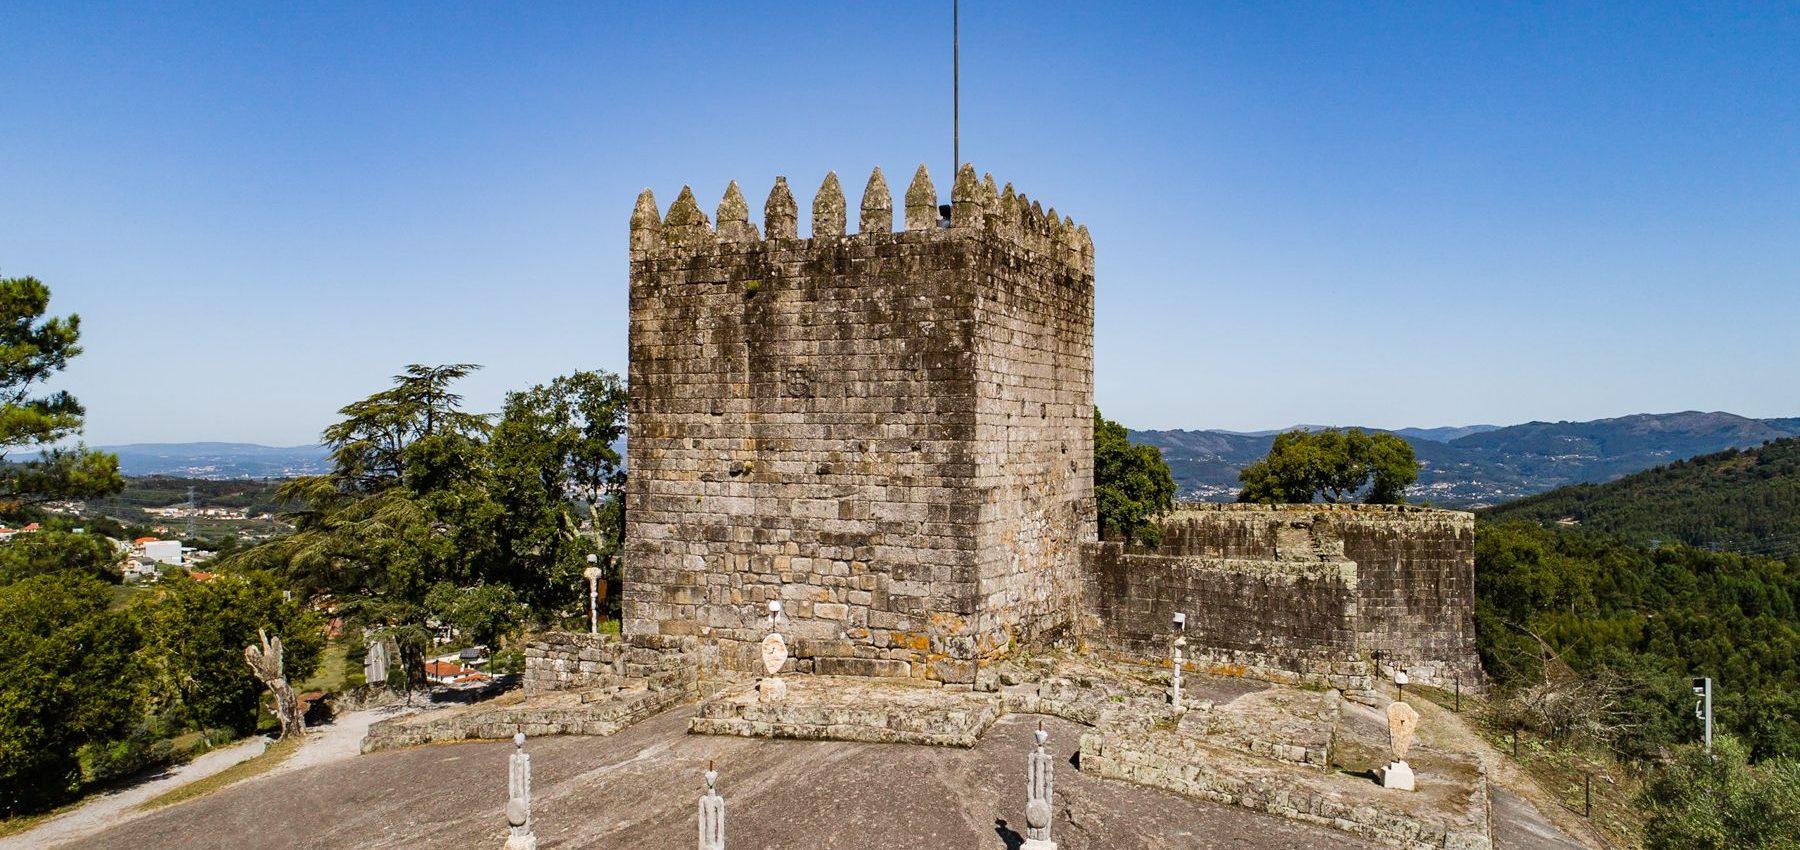 castelo_povoa_lanhoso